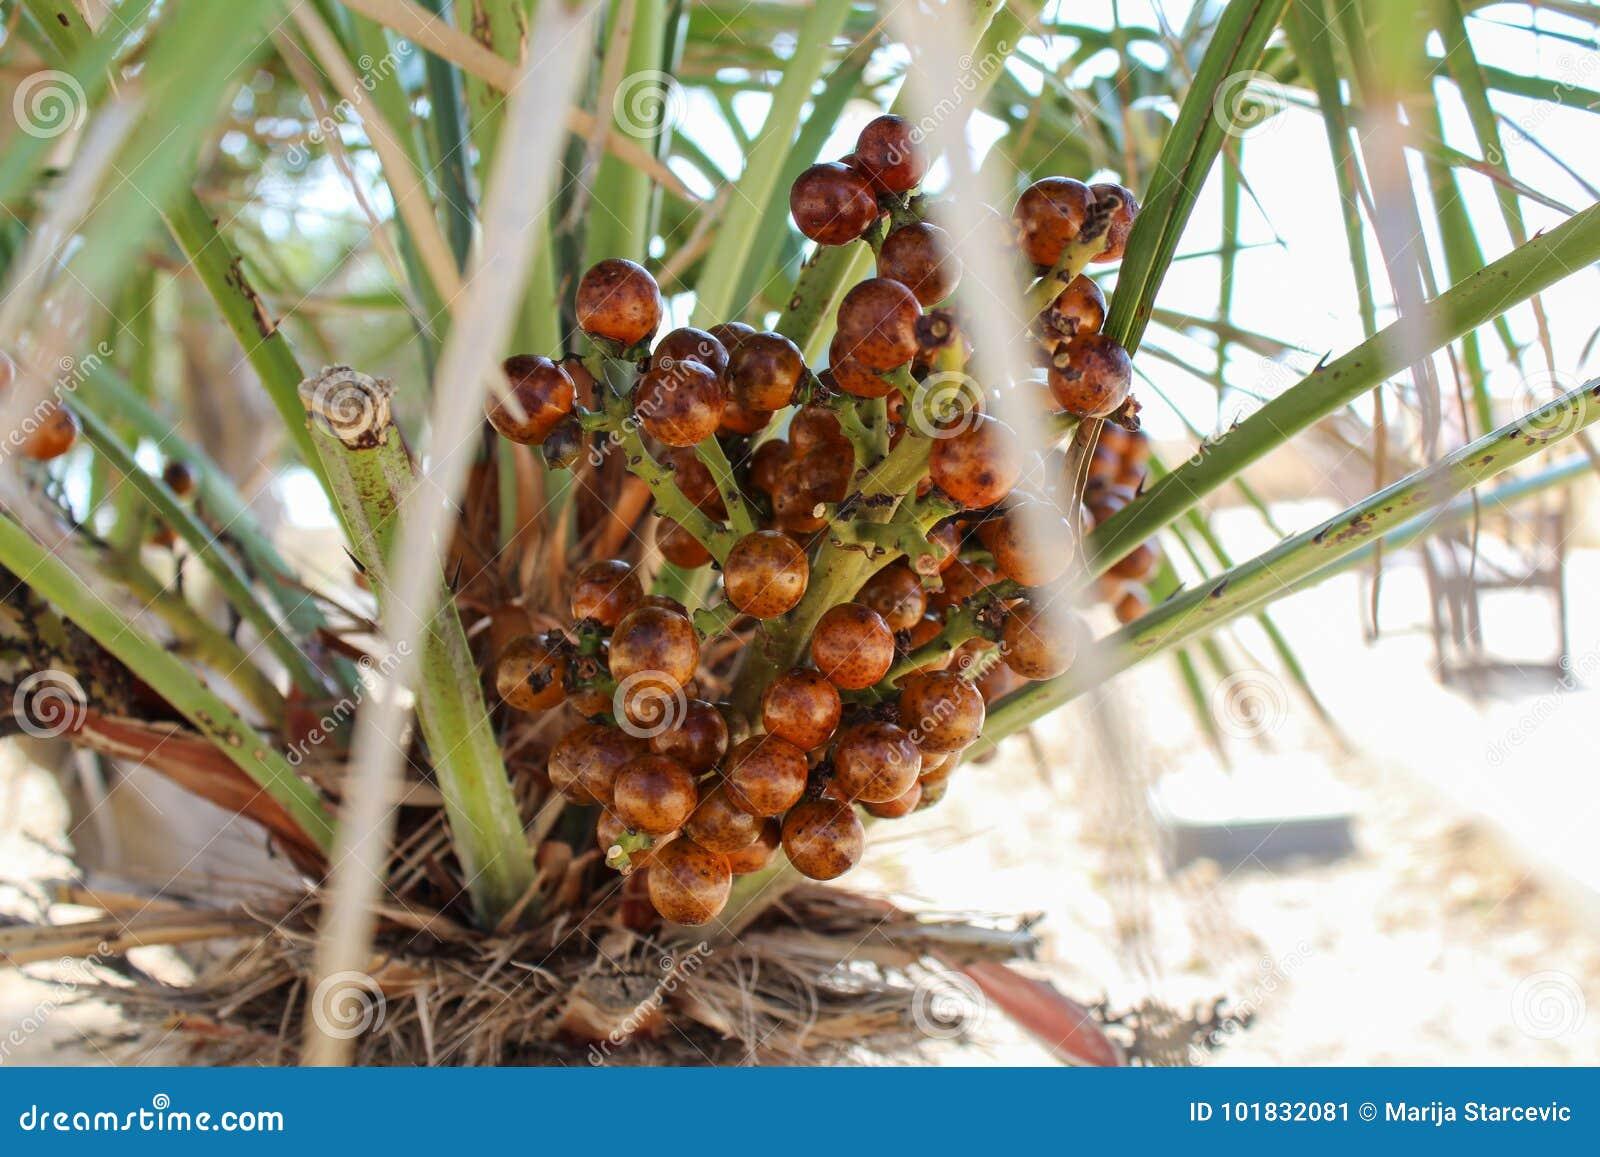 Palm fruit harvest, close up look malta